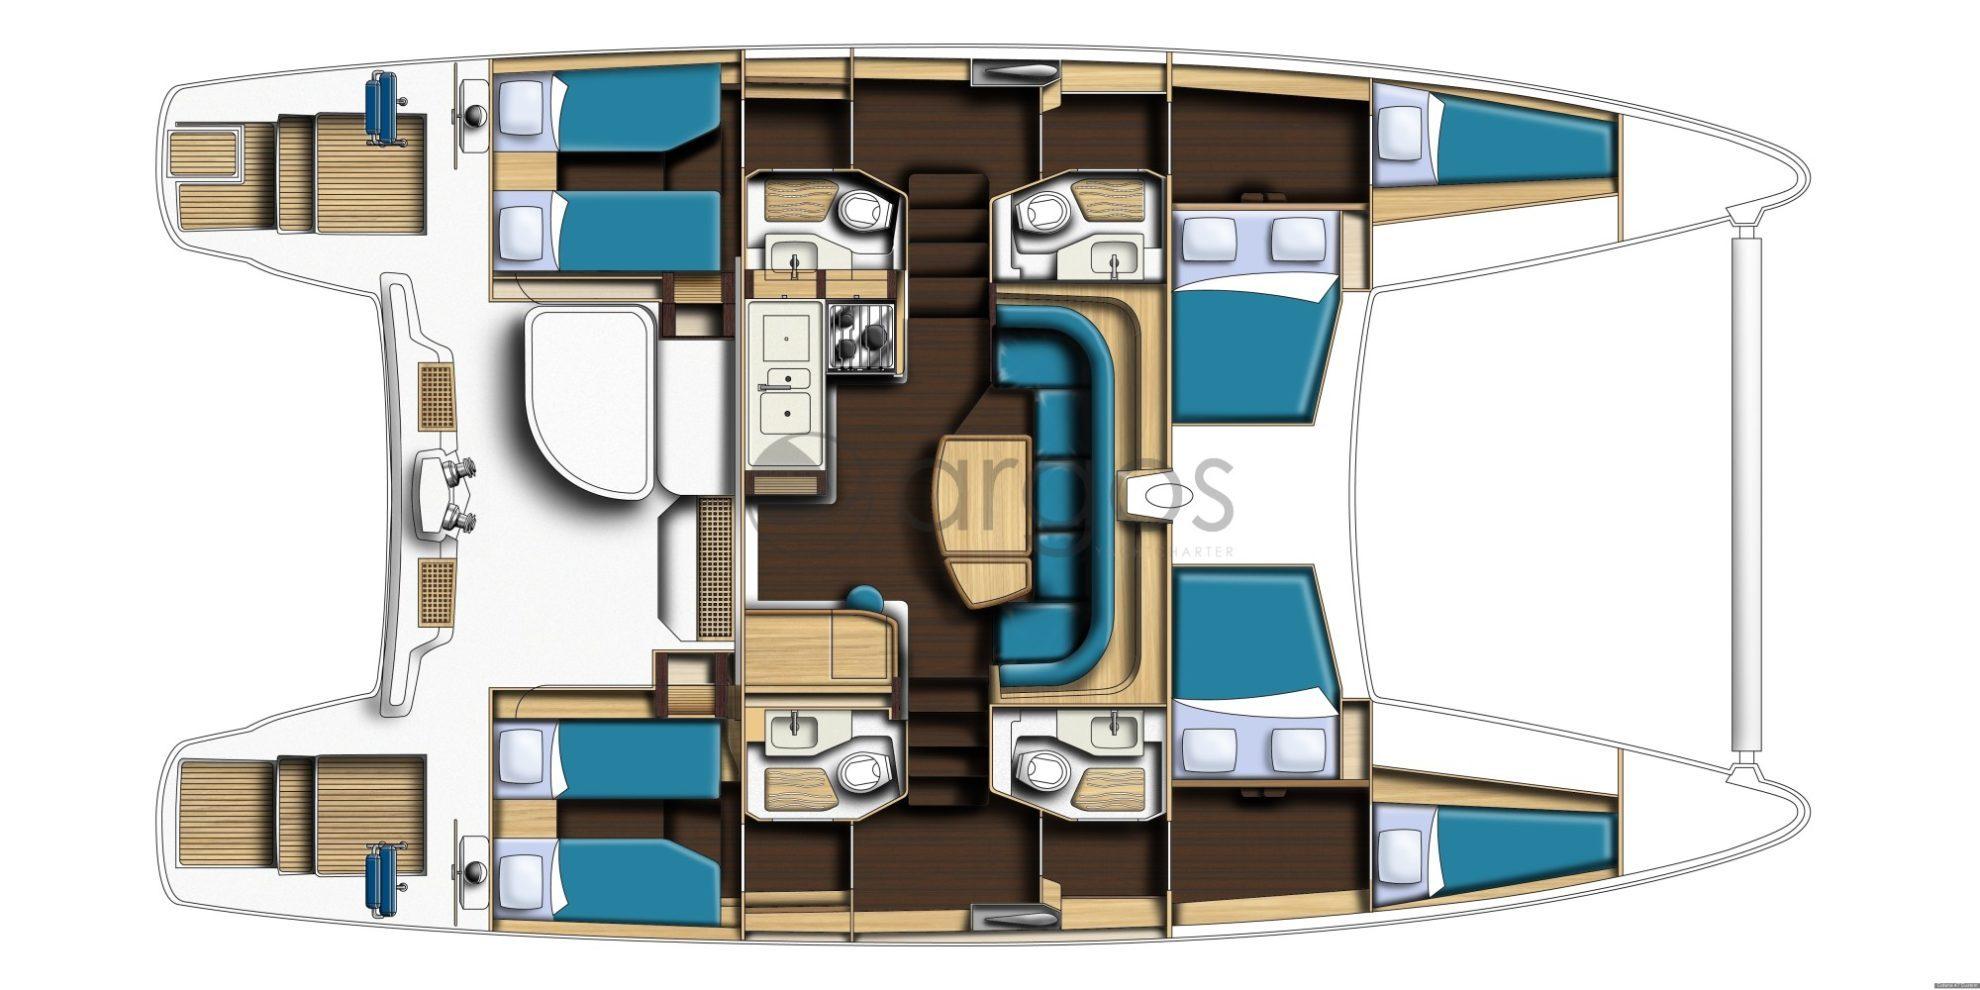 01 catana-47-custom-4-plus-2-kabinen-10